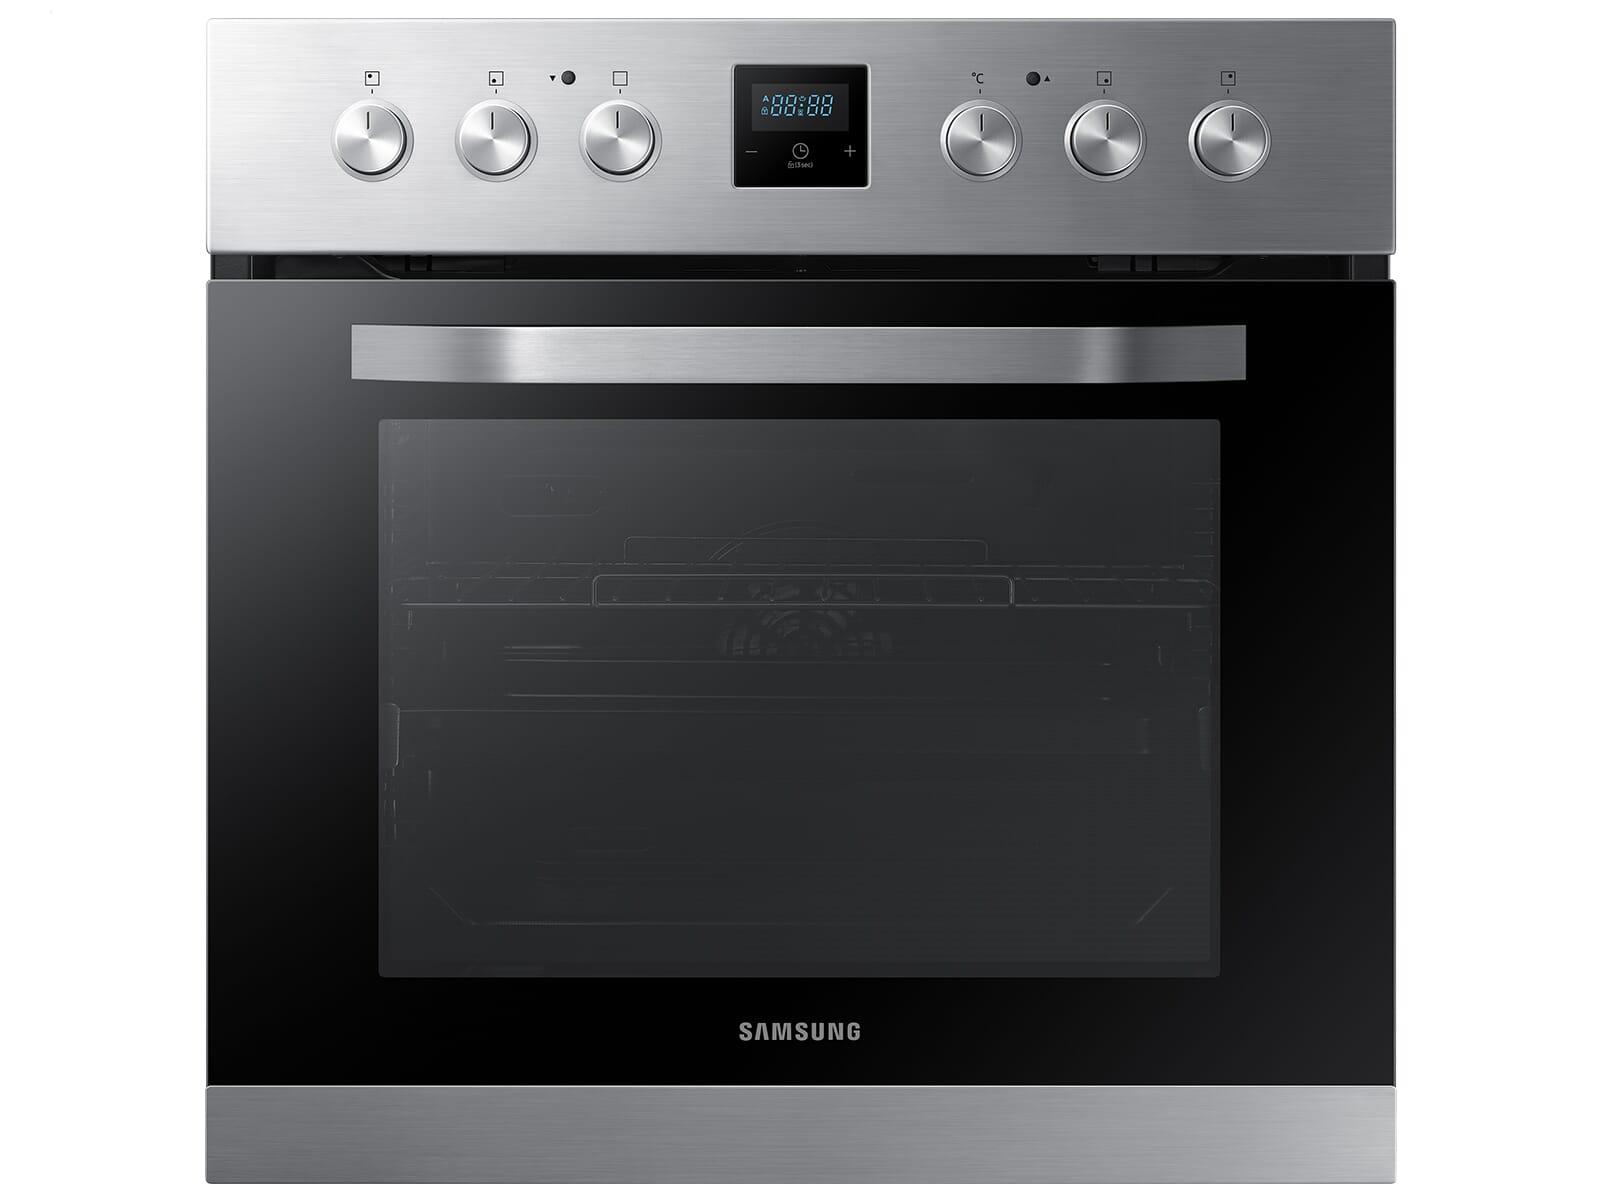 Samsung F-NB69R5701RS Set Einbauherd NB69R5701RS/EG + Induktionskochfeld NZ64R1705CK/EG